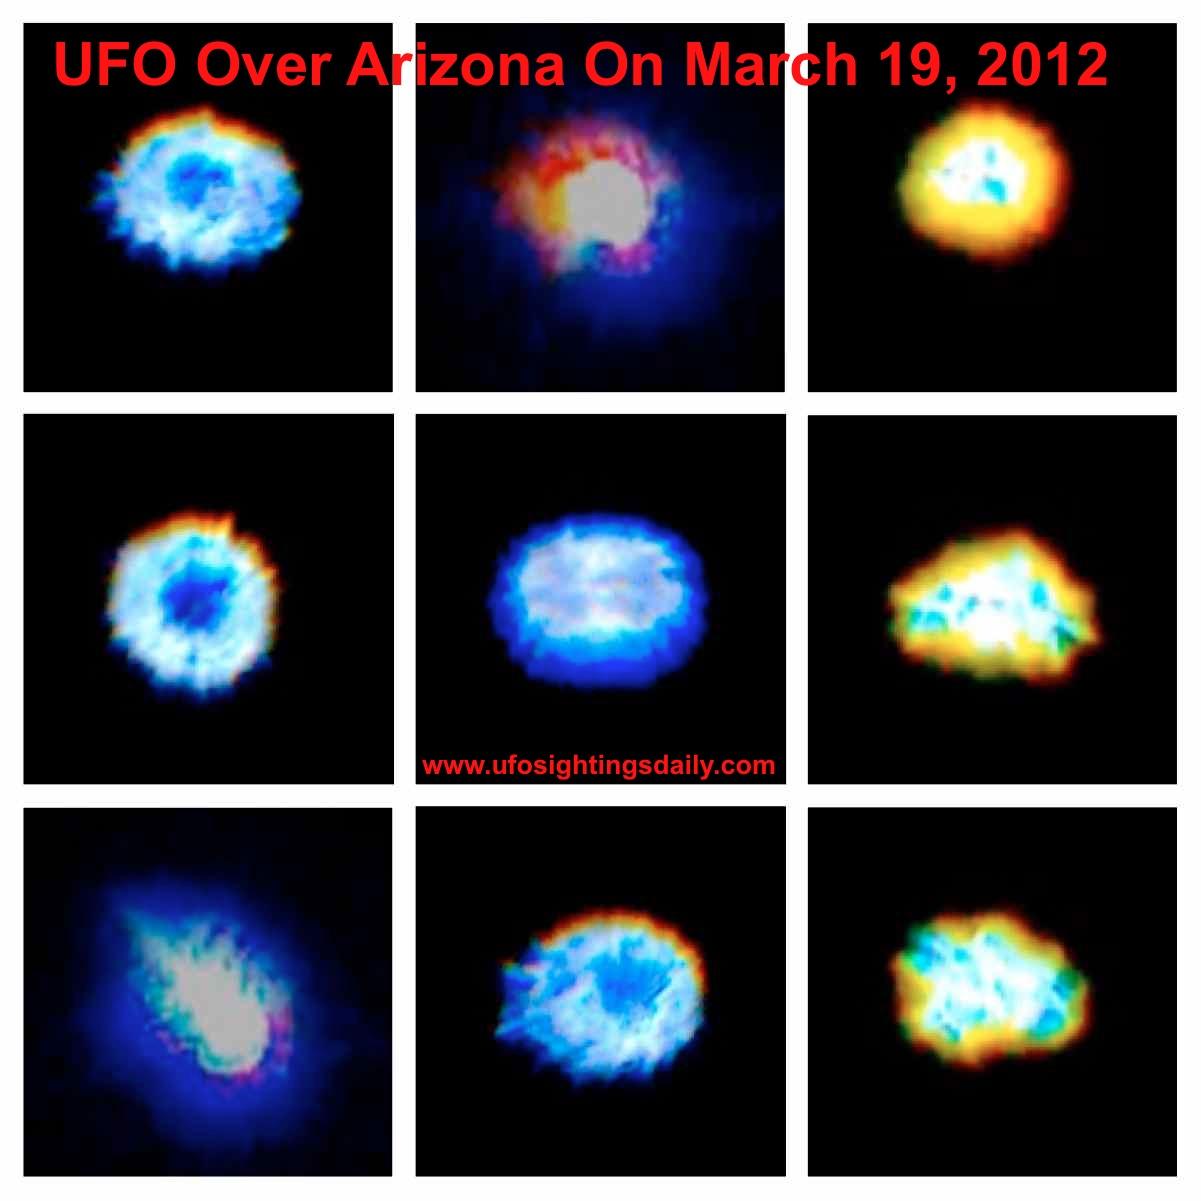 Ufo ufos sighting sightings alien aliens orb orbs orbit nasa